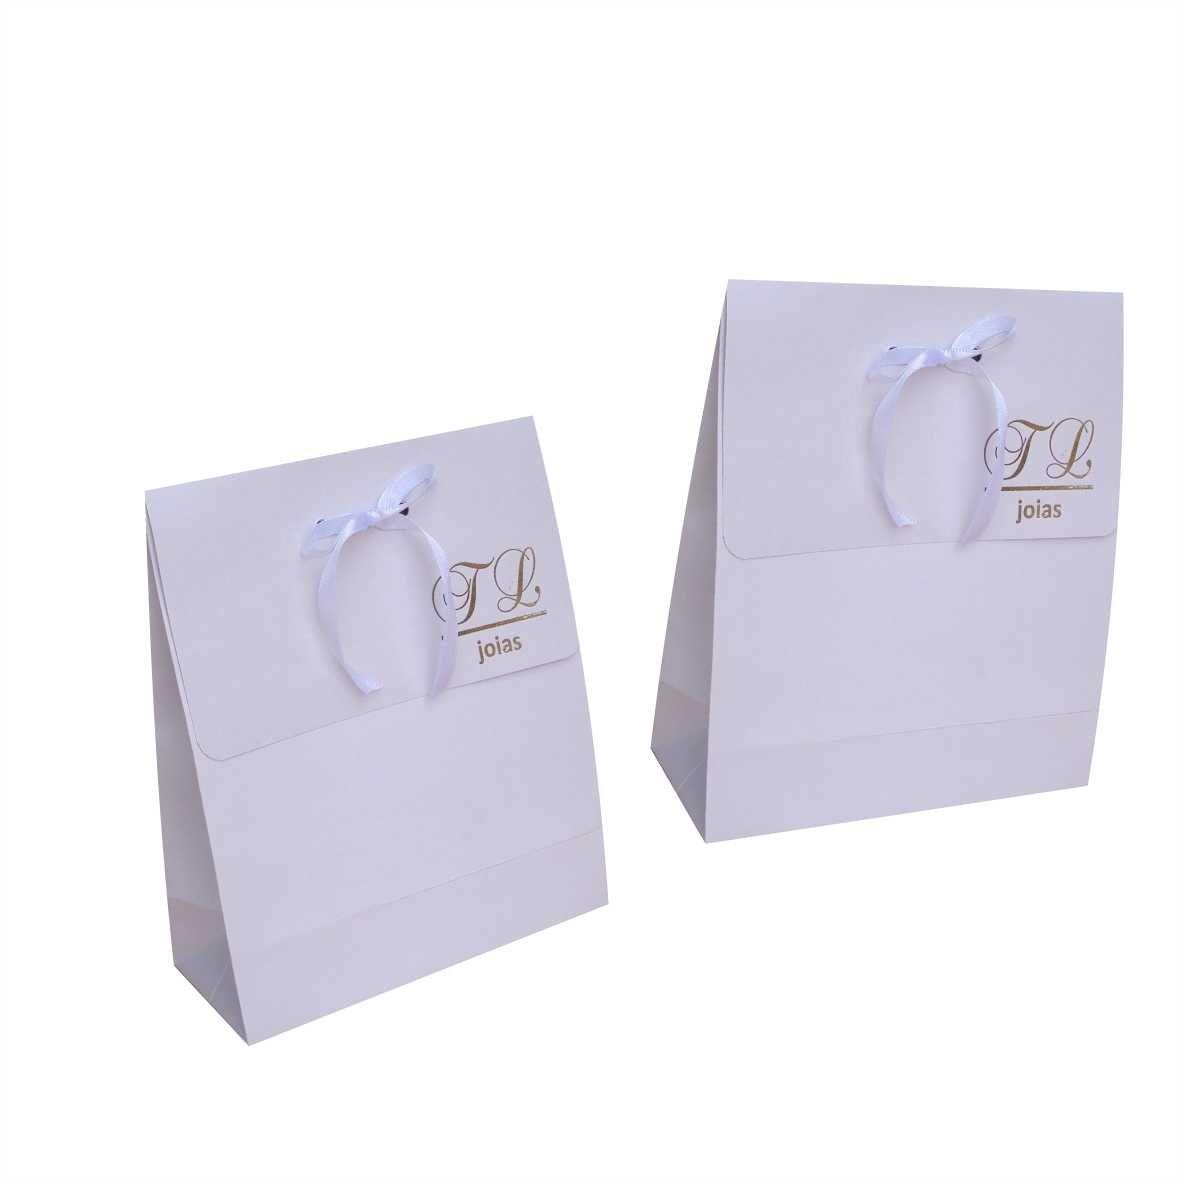 Sacola branca pequena - personalizada para bijuterias (15x17x6,5 cm) 100 unidades